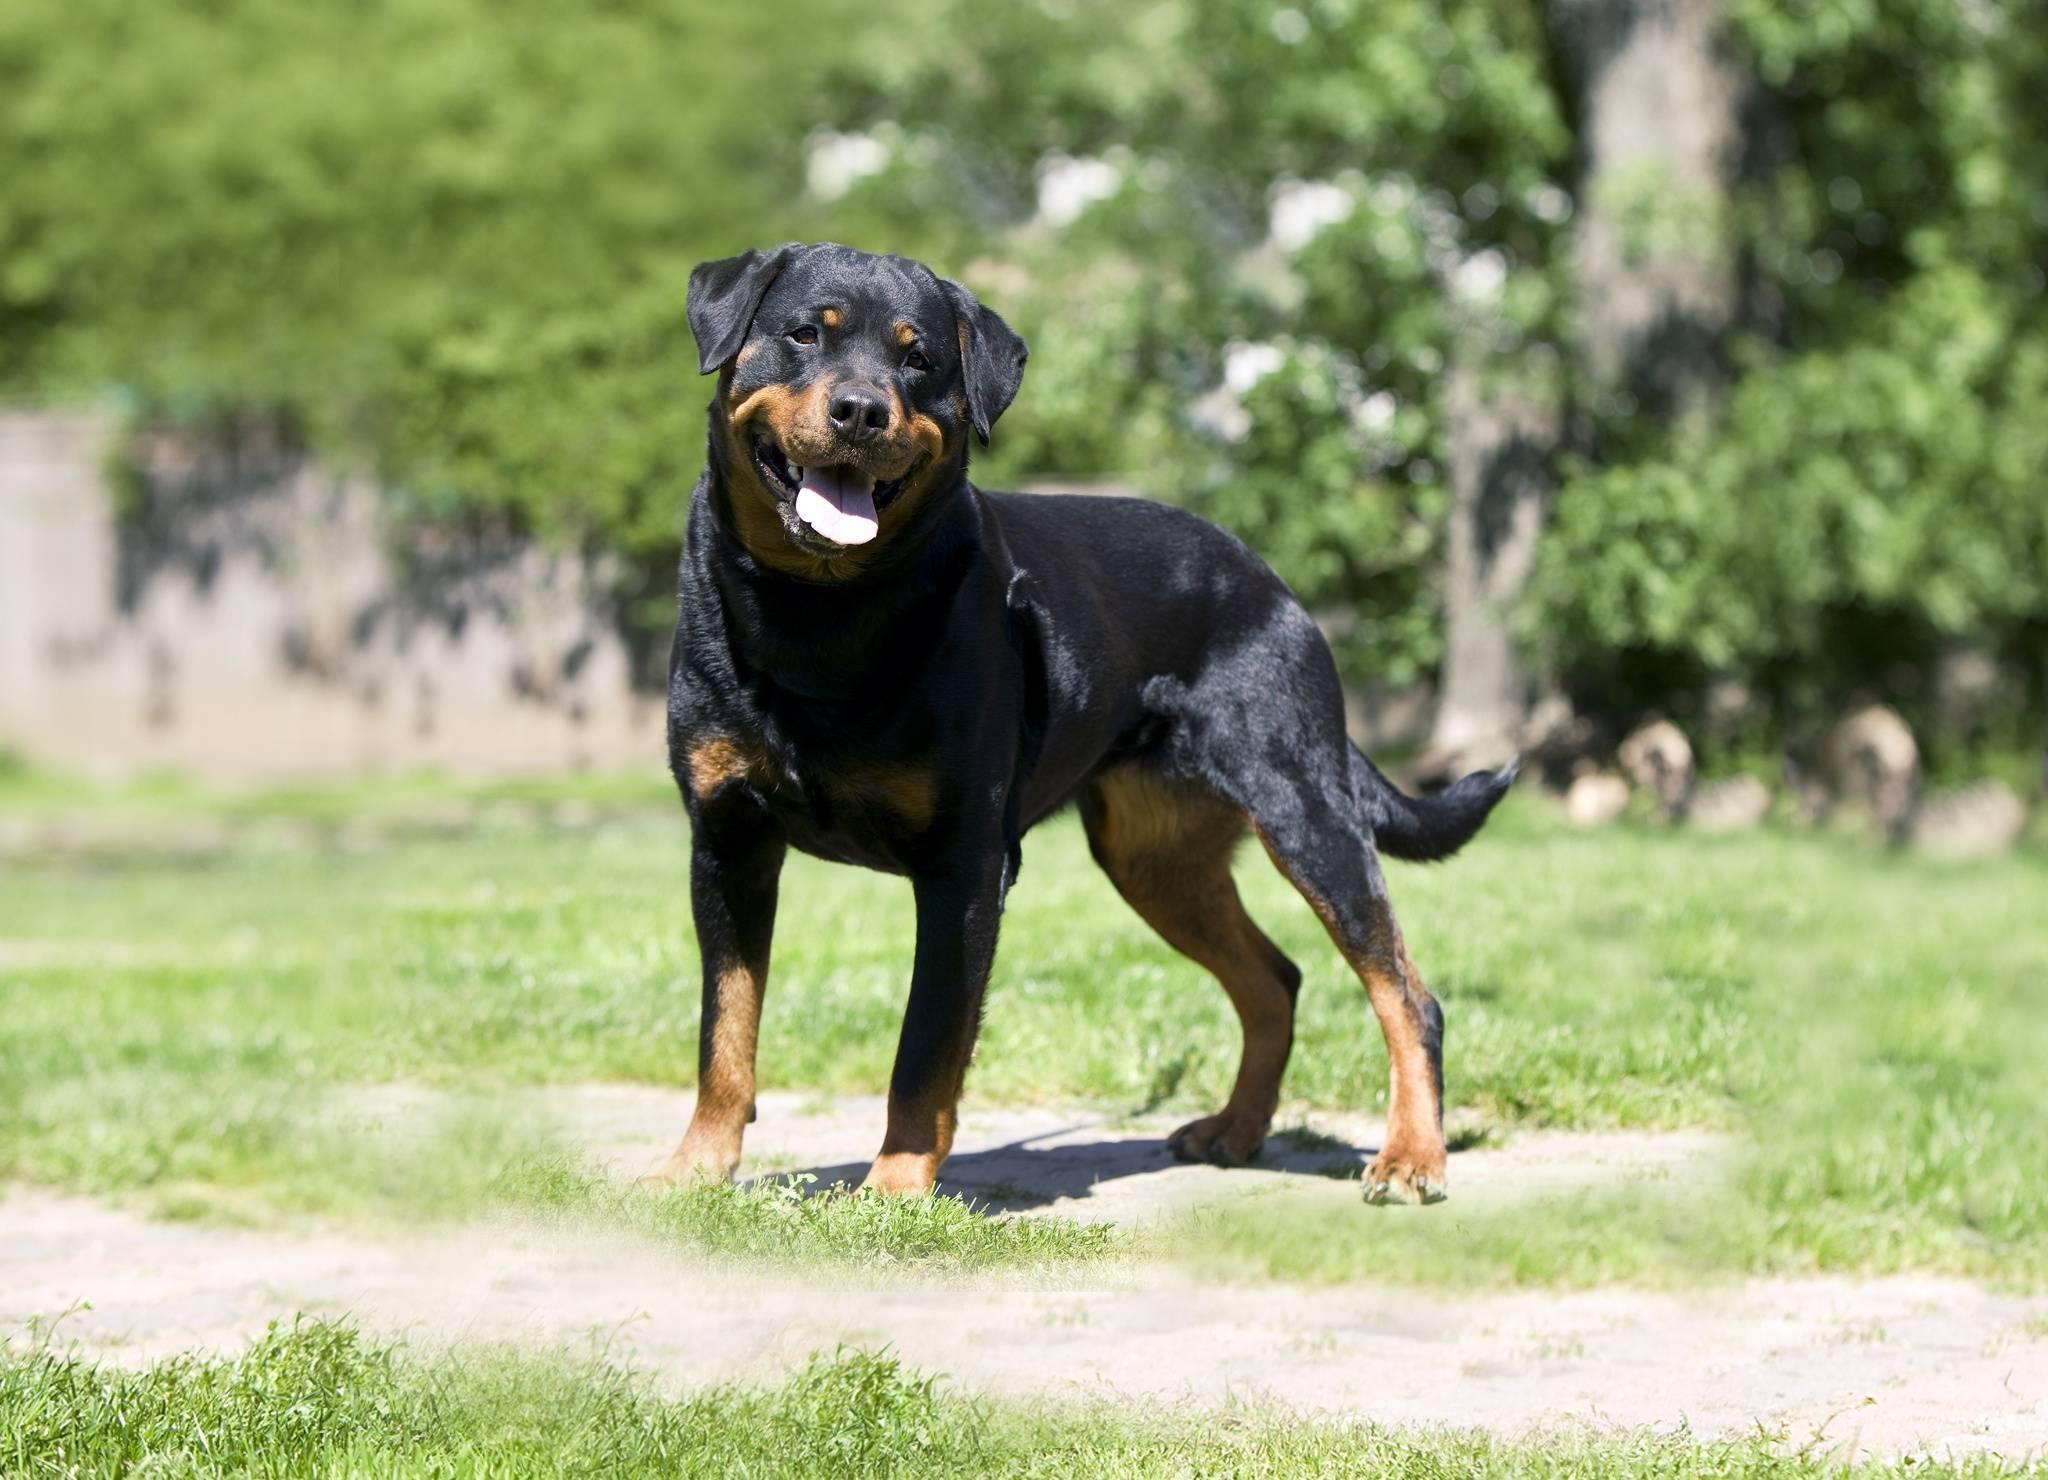 Дратхаар собака. описание, особенности, уход и цена дратхаара | sobakagav.ru